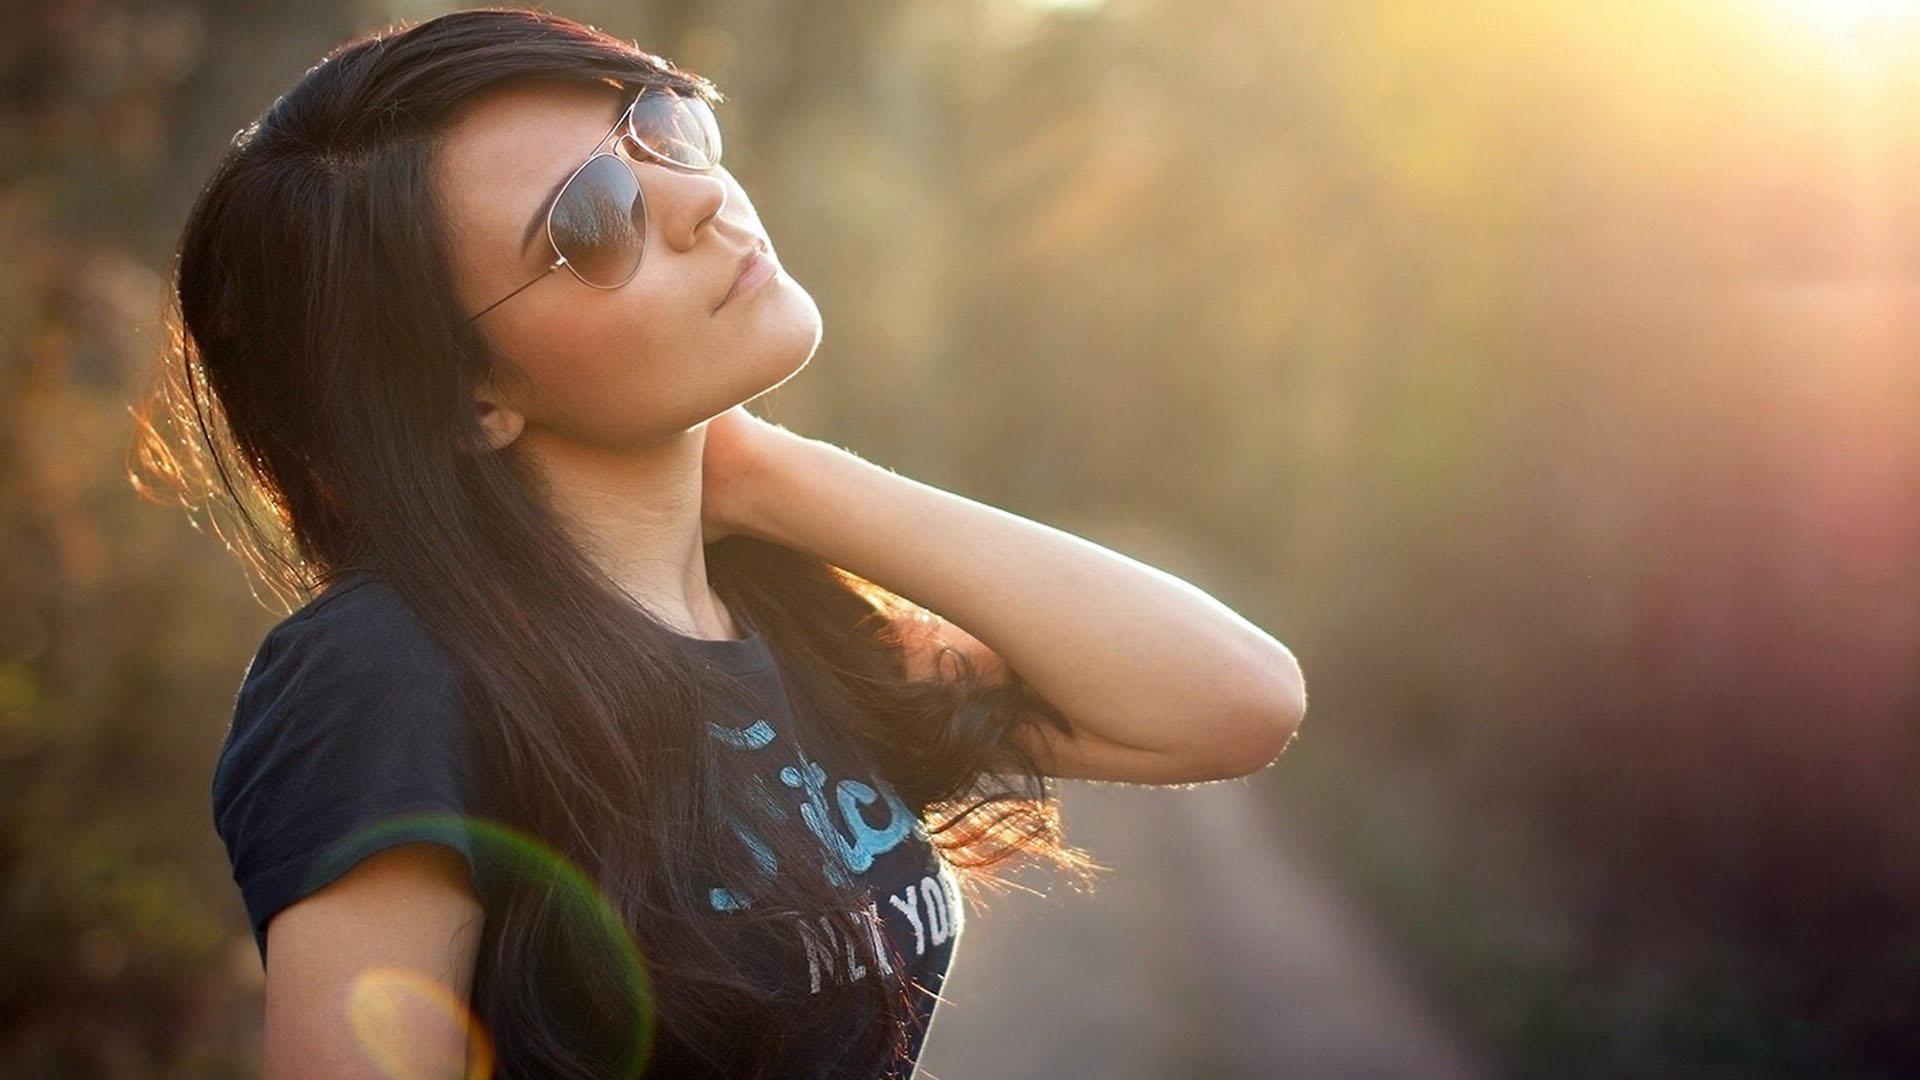 Girl Smoking Hd Wallpaper Girls Wearing Sun Glass Profile Pictures Glass Profile